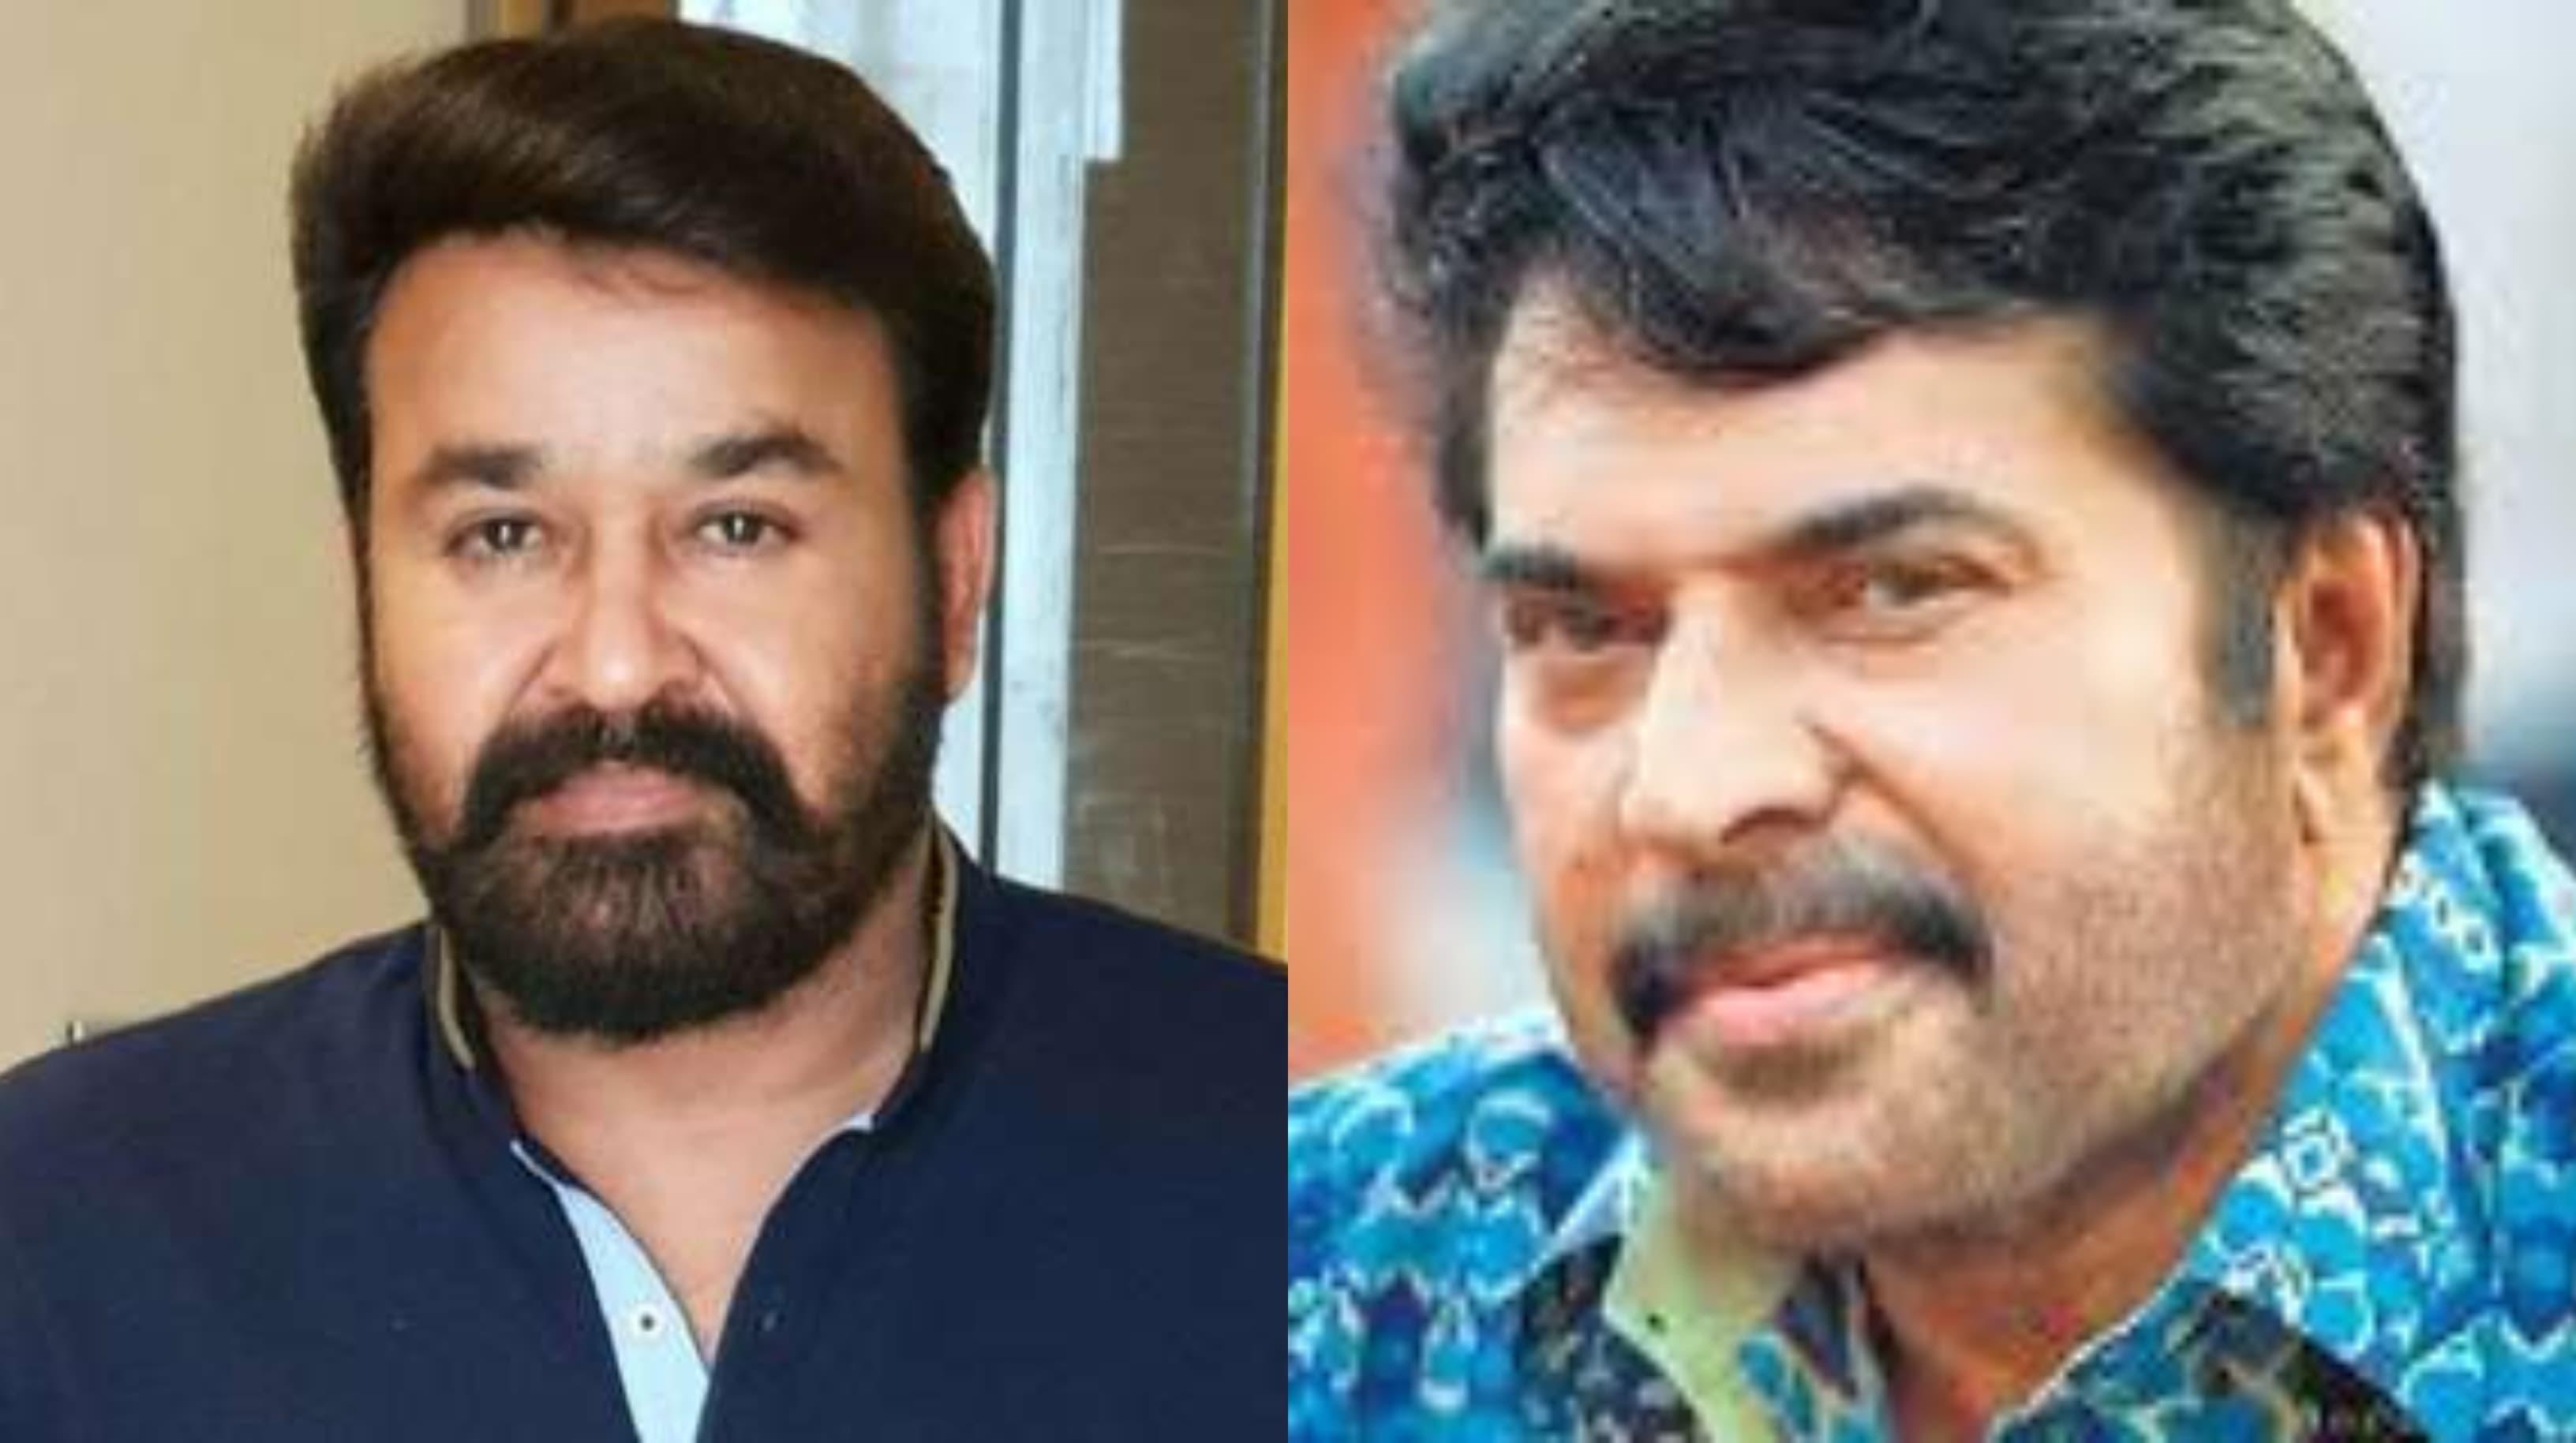 Mohanlal and Mammootty are megastars of Malayalam cinema